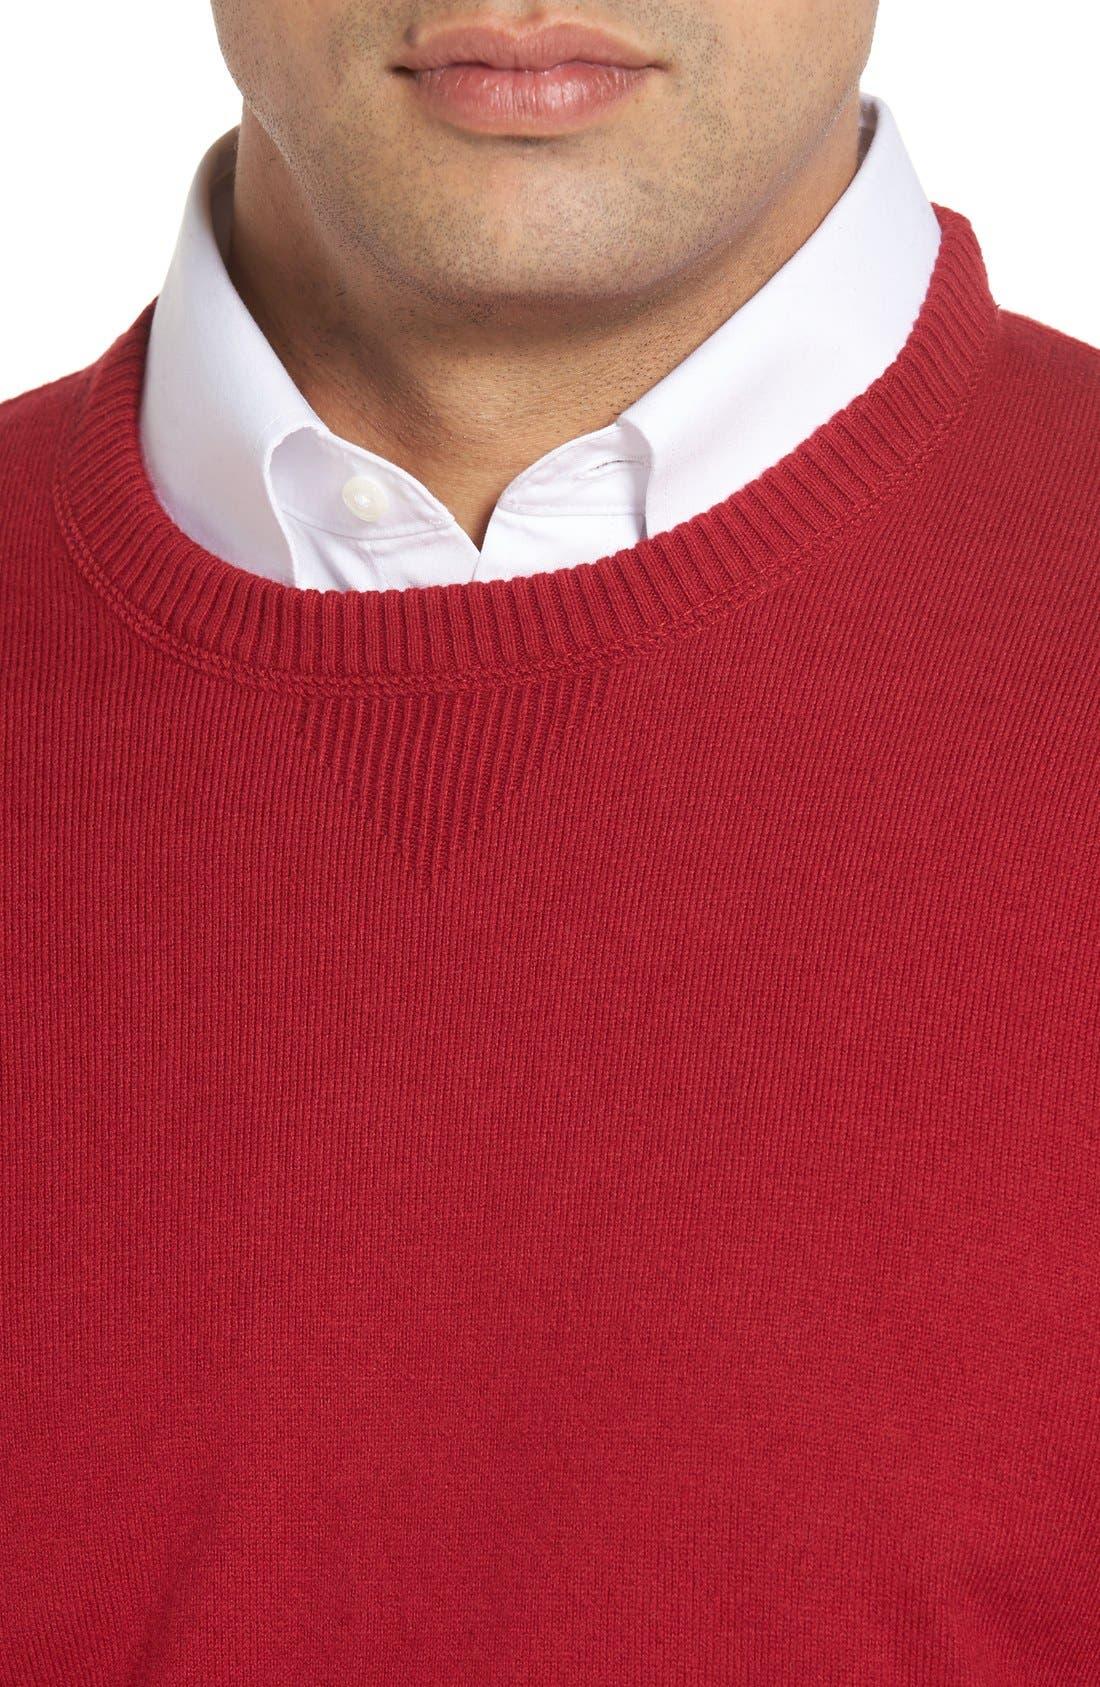 'Jersey Sport' Cotton Blend Crewneck Sweater,                             Alternate thumbnail 32, color,